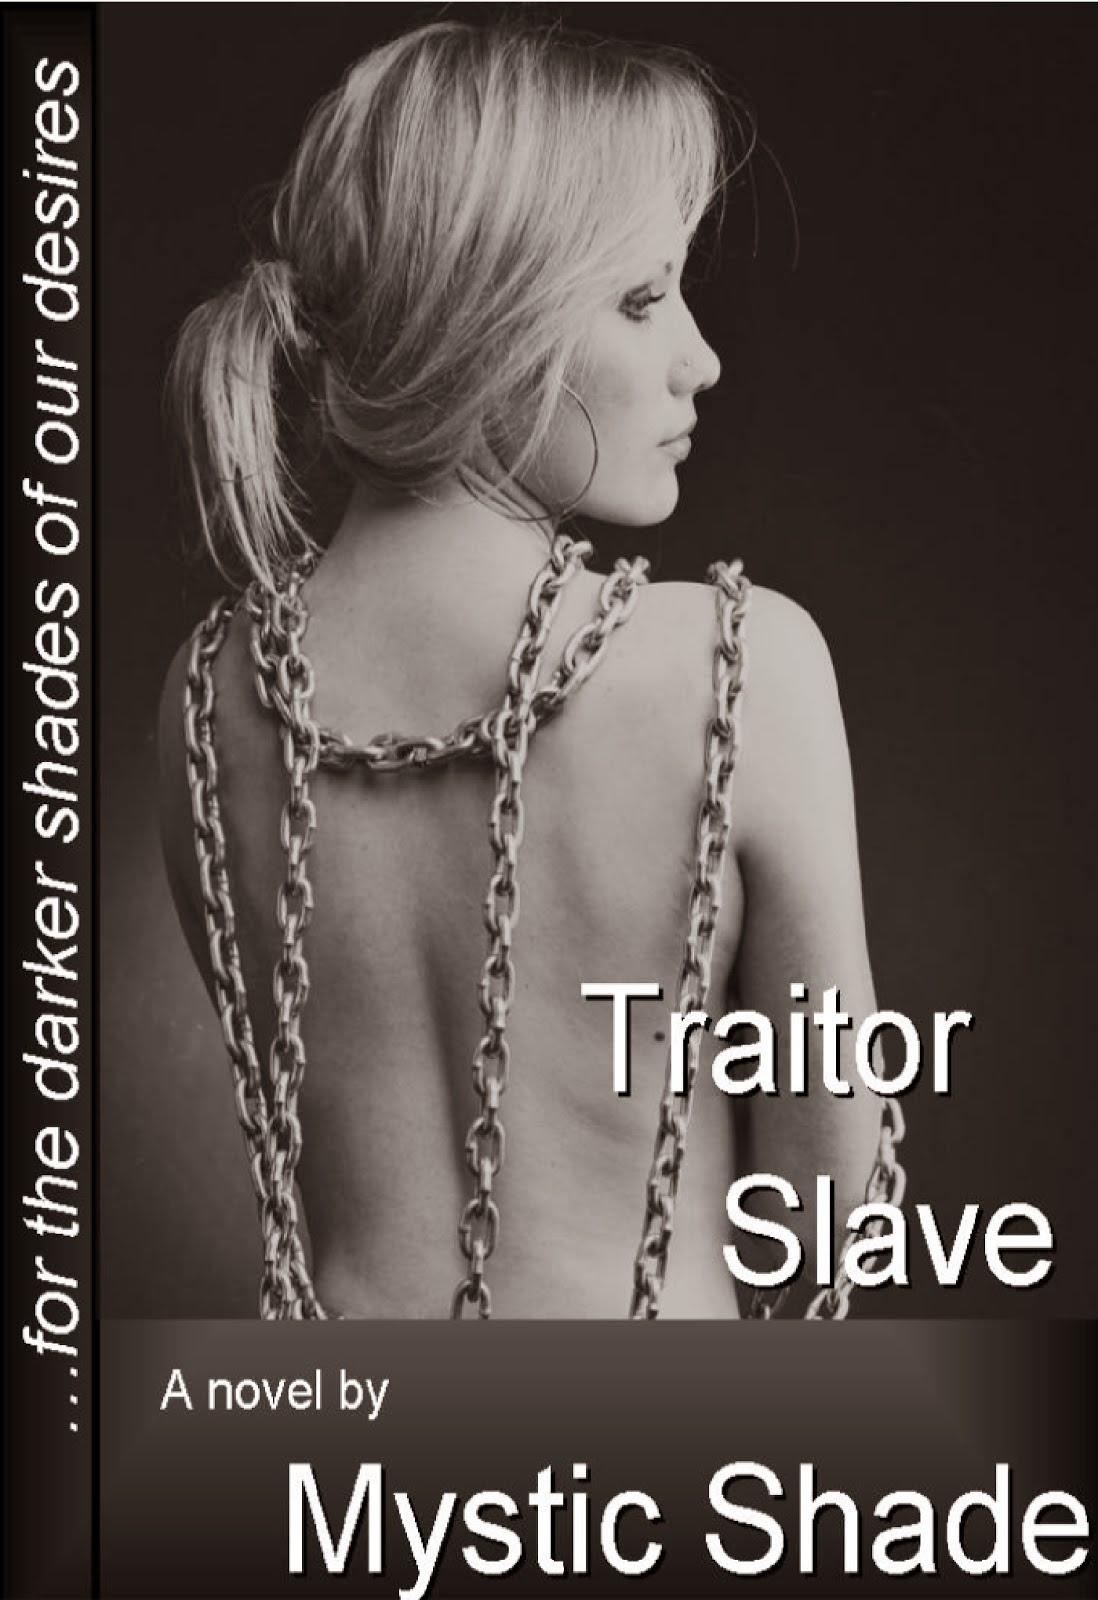 TRAITOR SLAVE